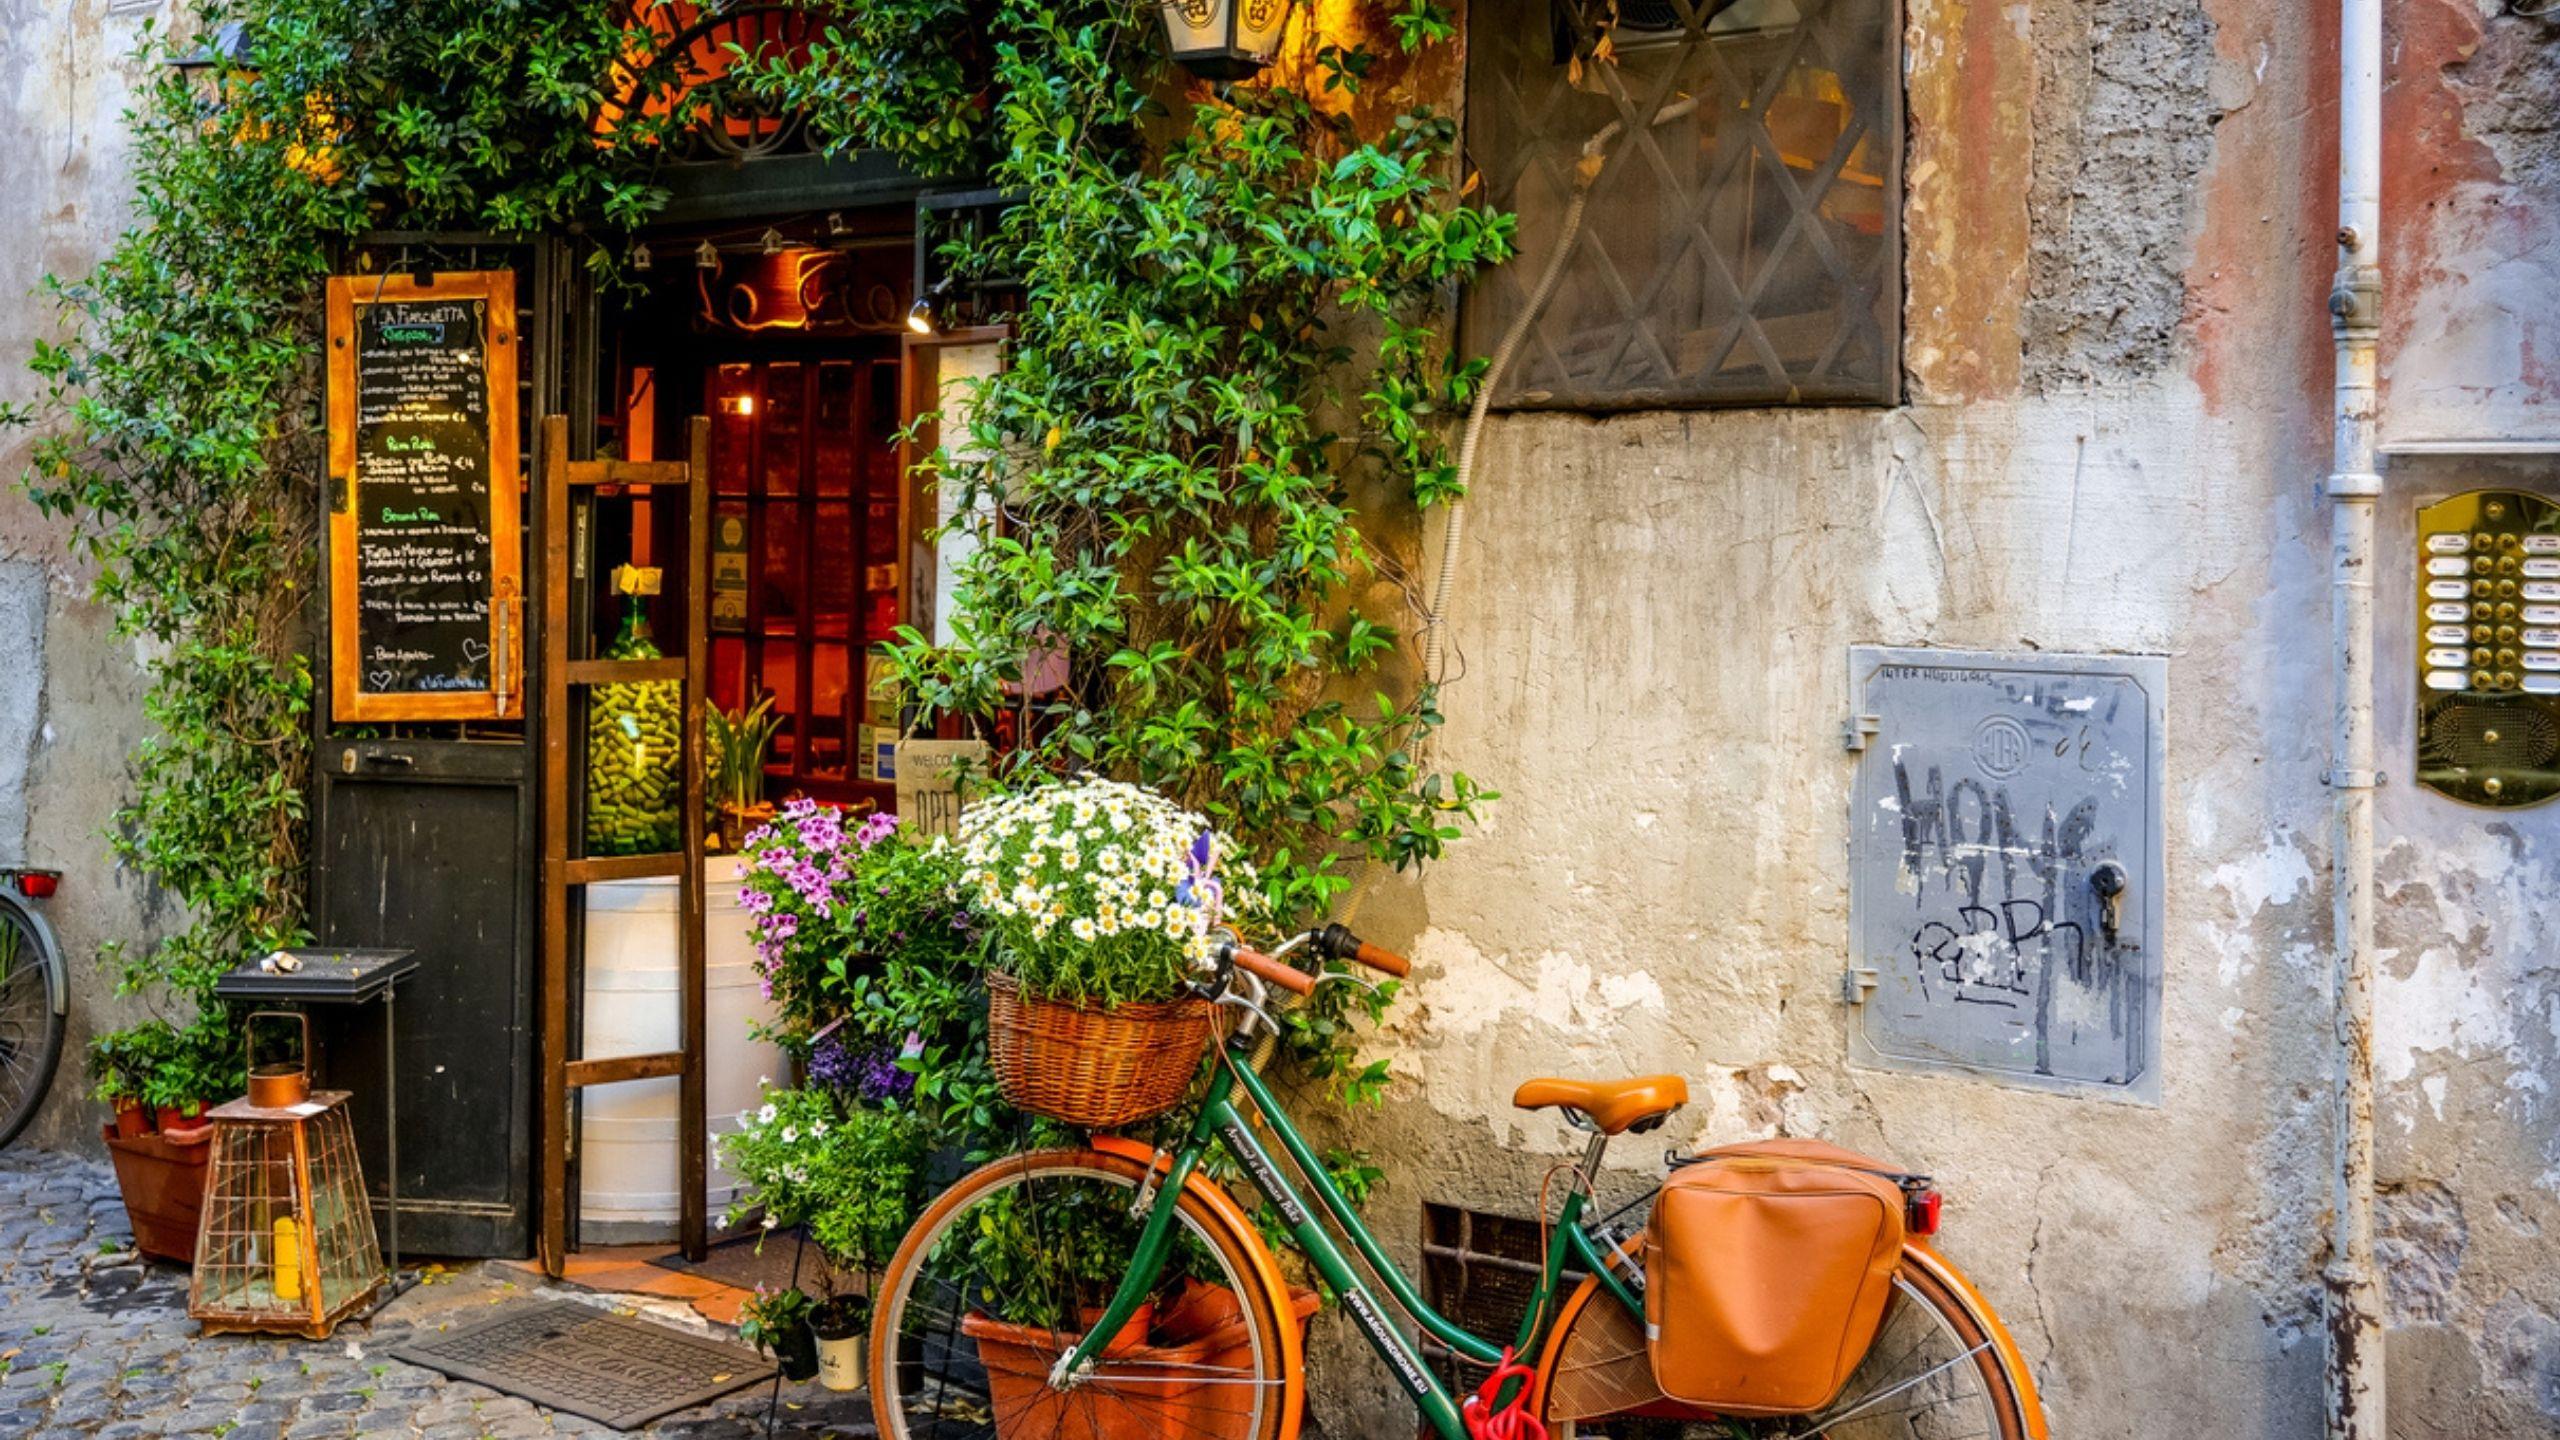 eitch-borromini-piazza-navona-roma-mangiare-bene.jpg